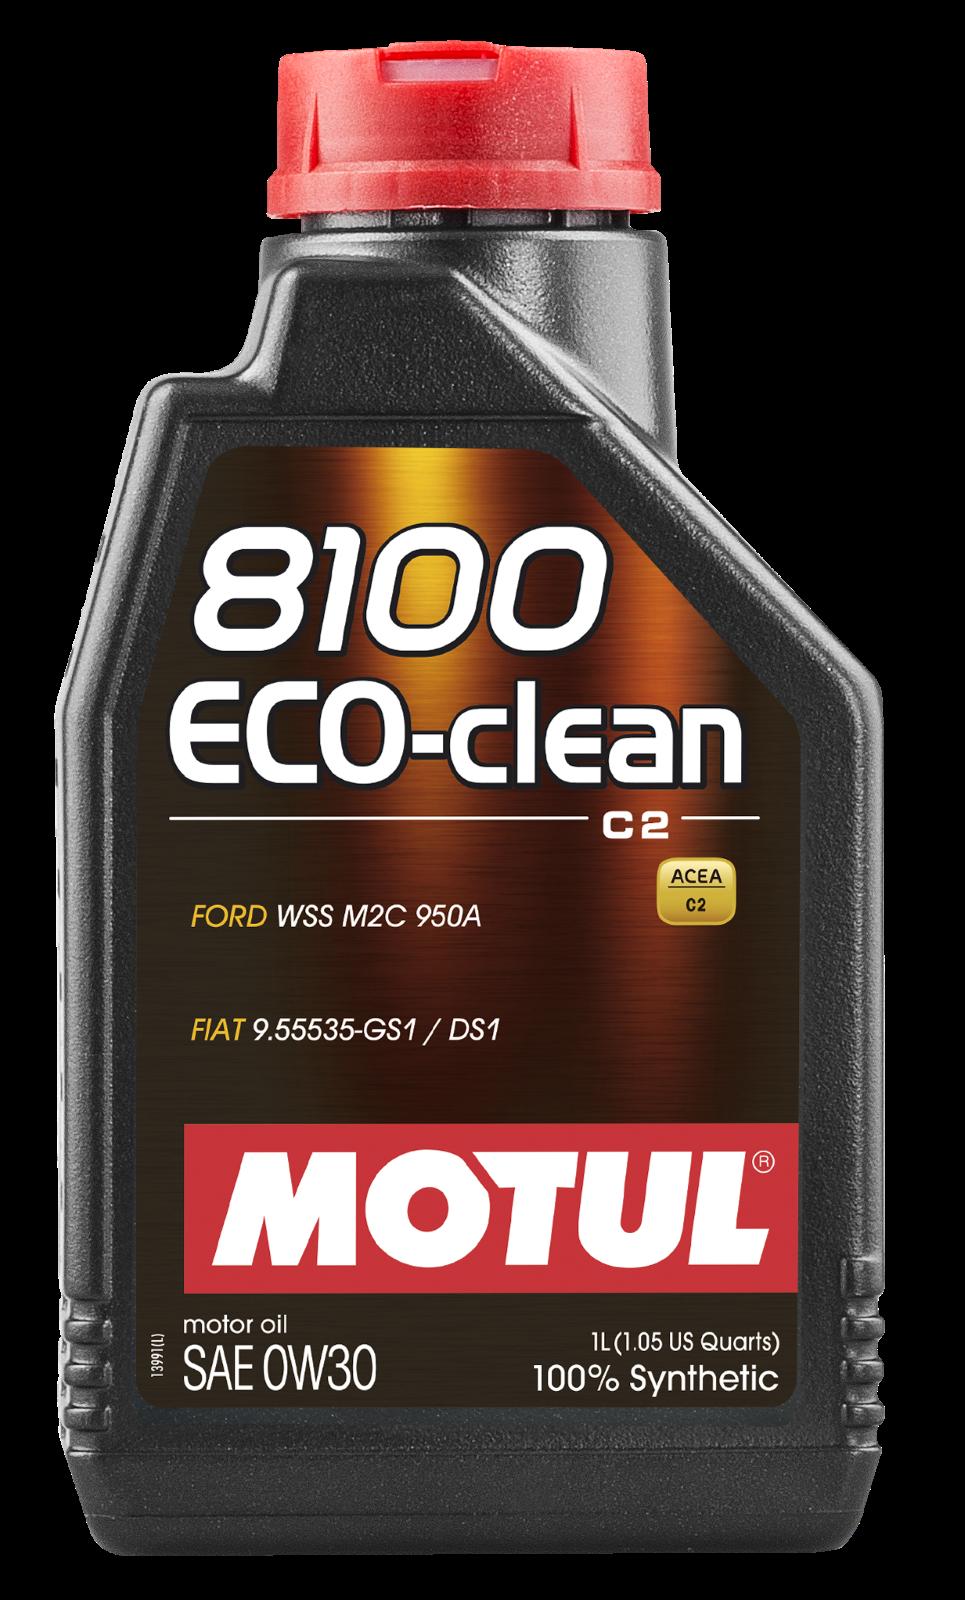 MOTUL AG MOTUL 8100 Eco-clean 0W-30 1L